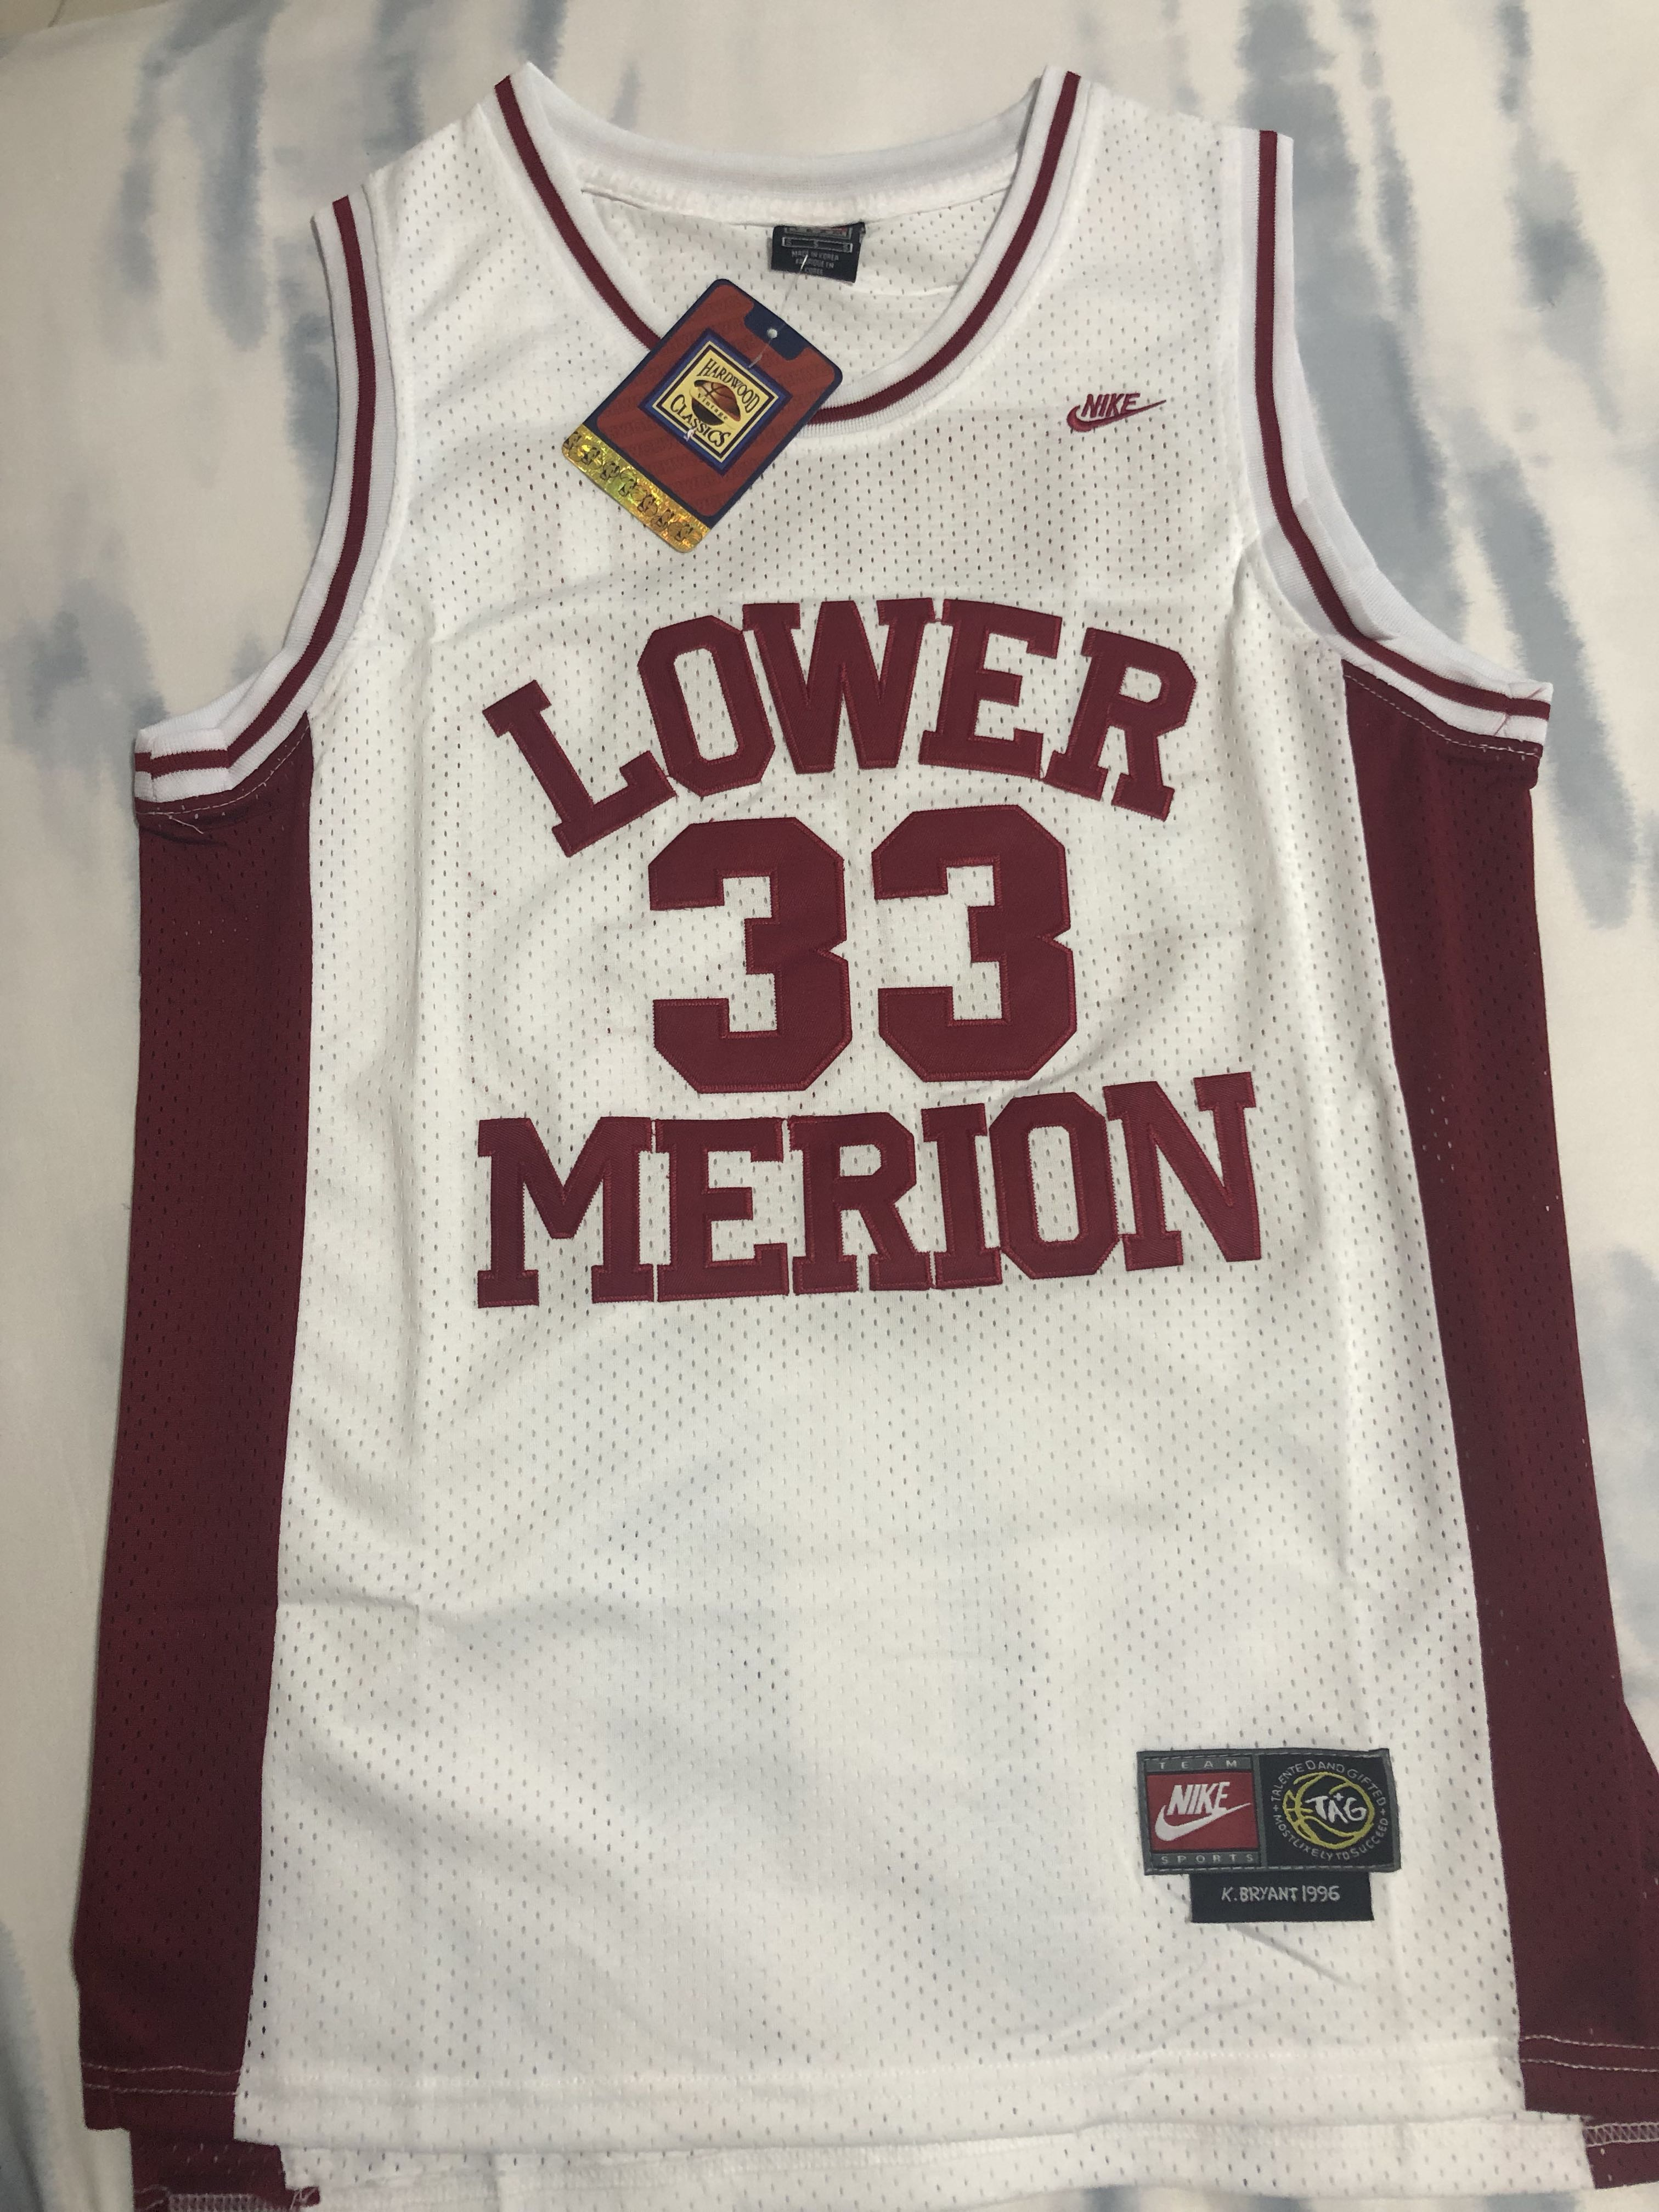 Kobe bryant high school jersey - Lower Merion (original nike ...